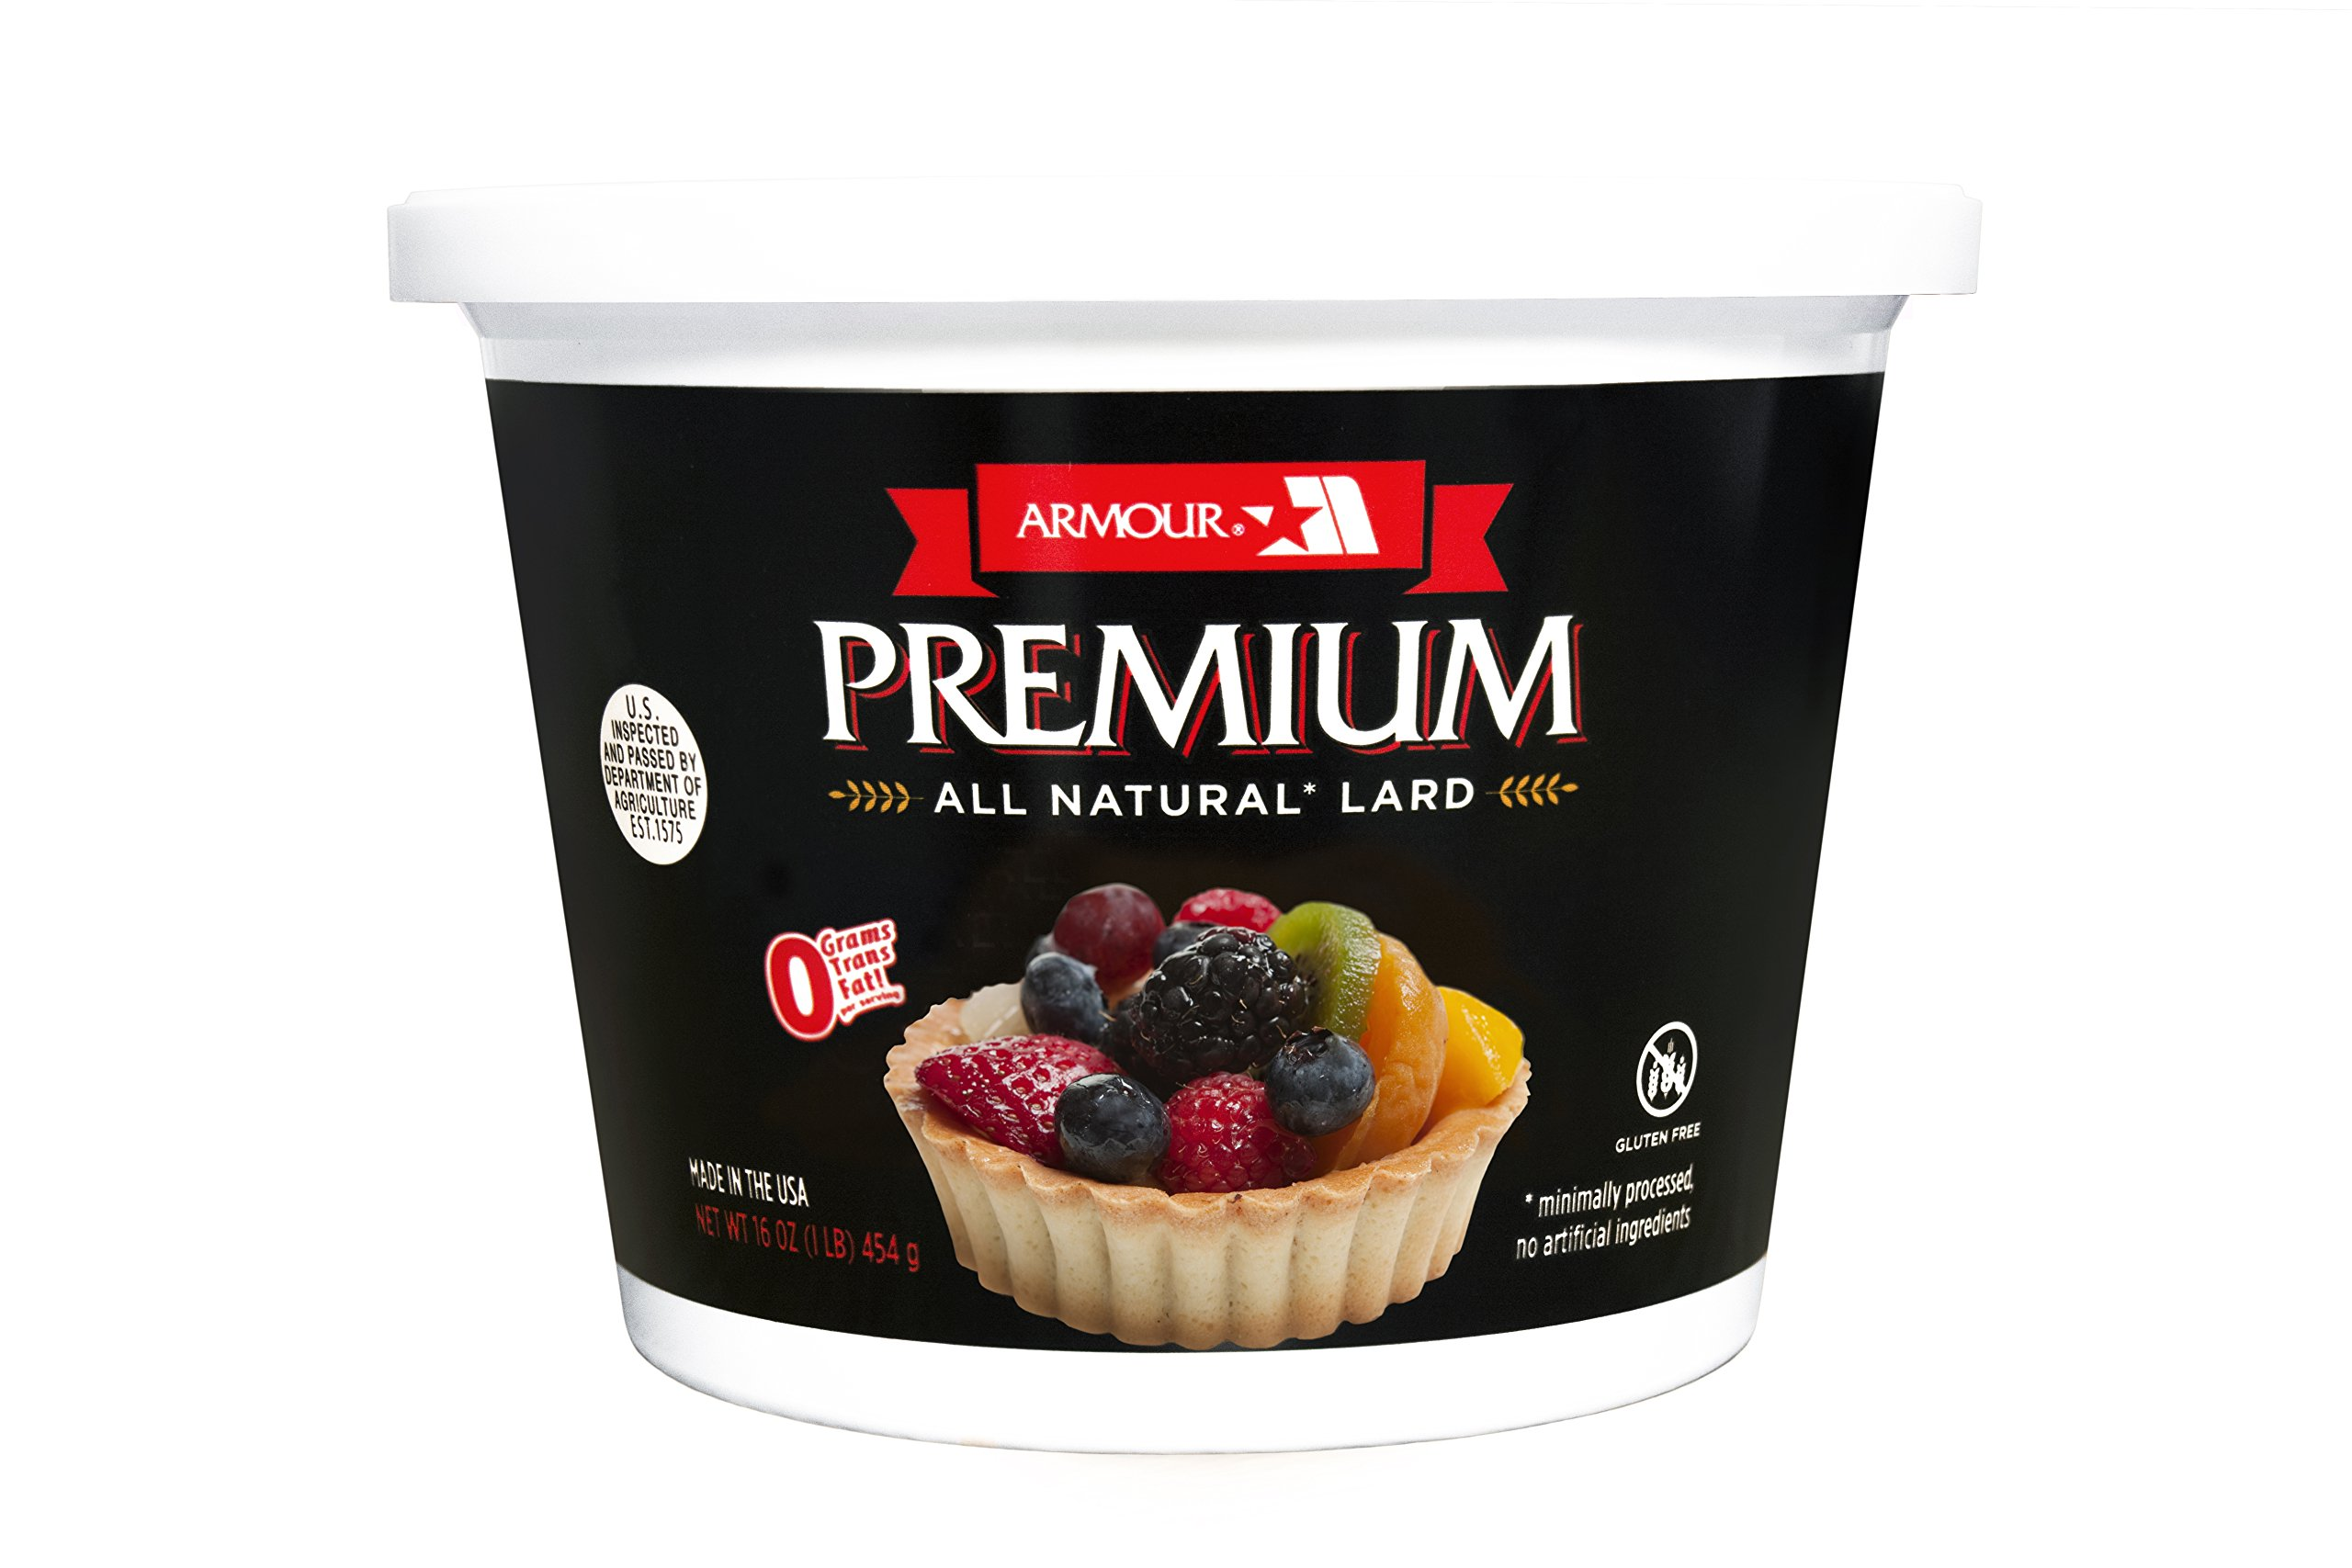 Premium All Natural Lard - 1 lb. Tub